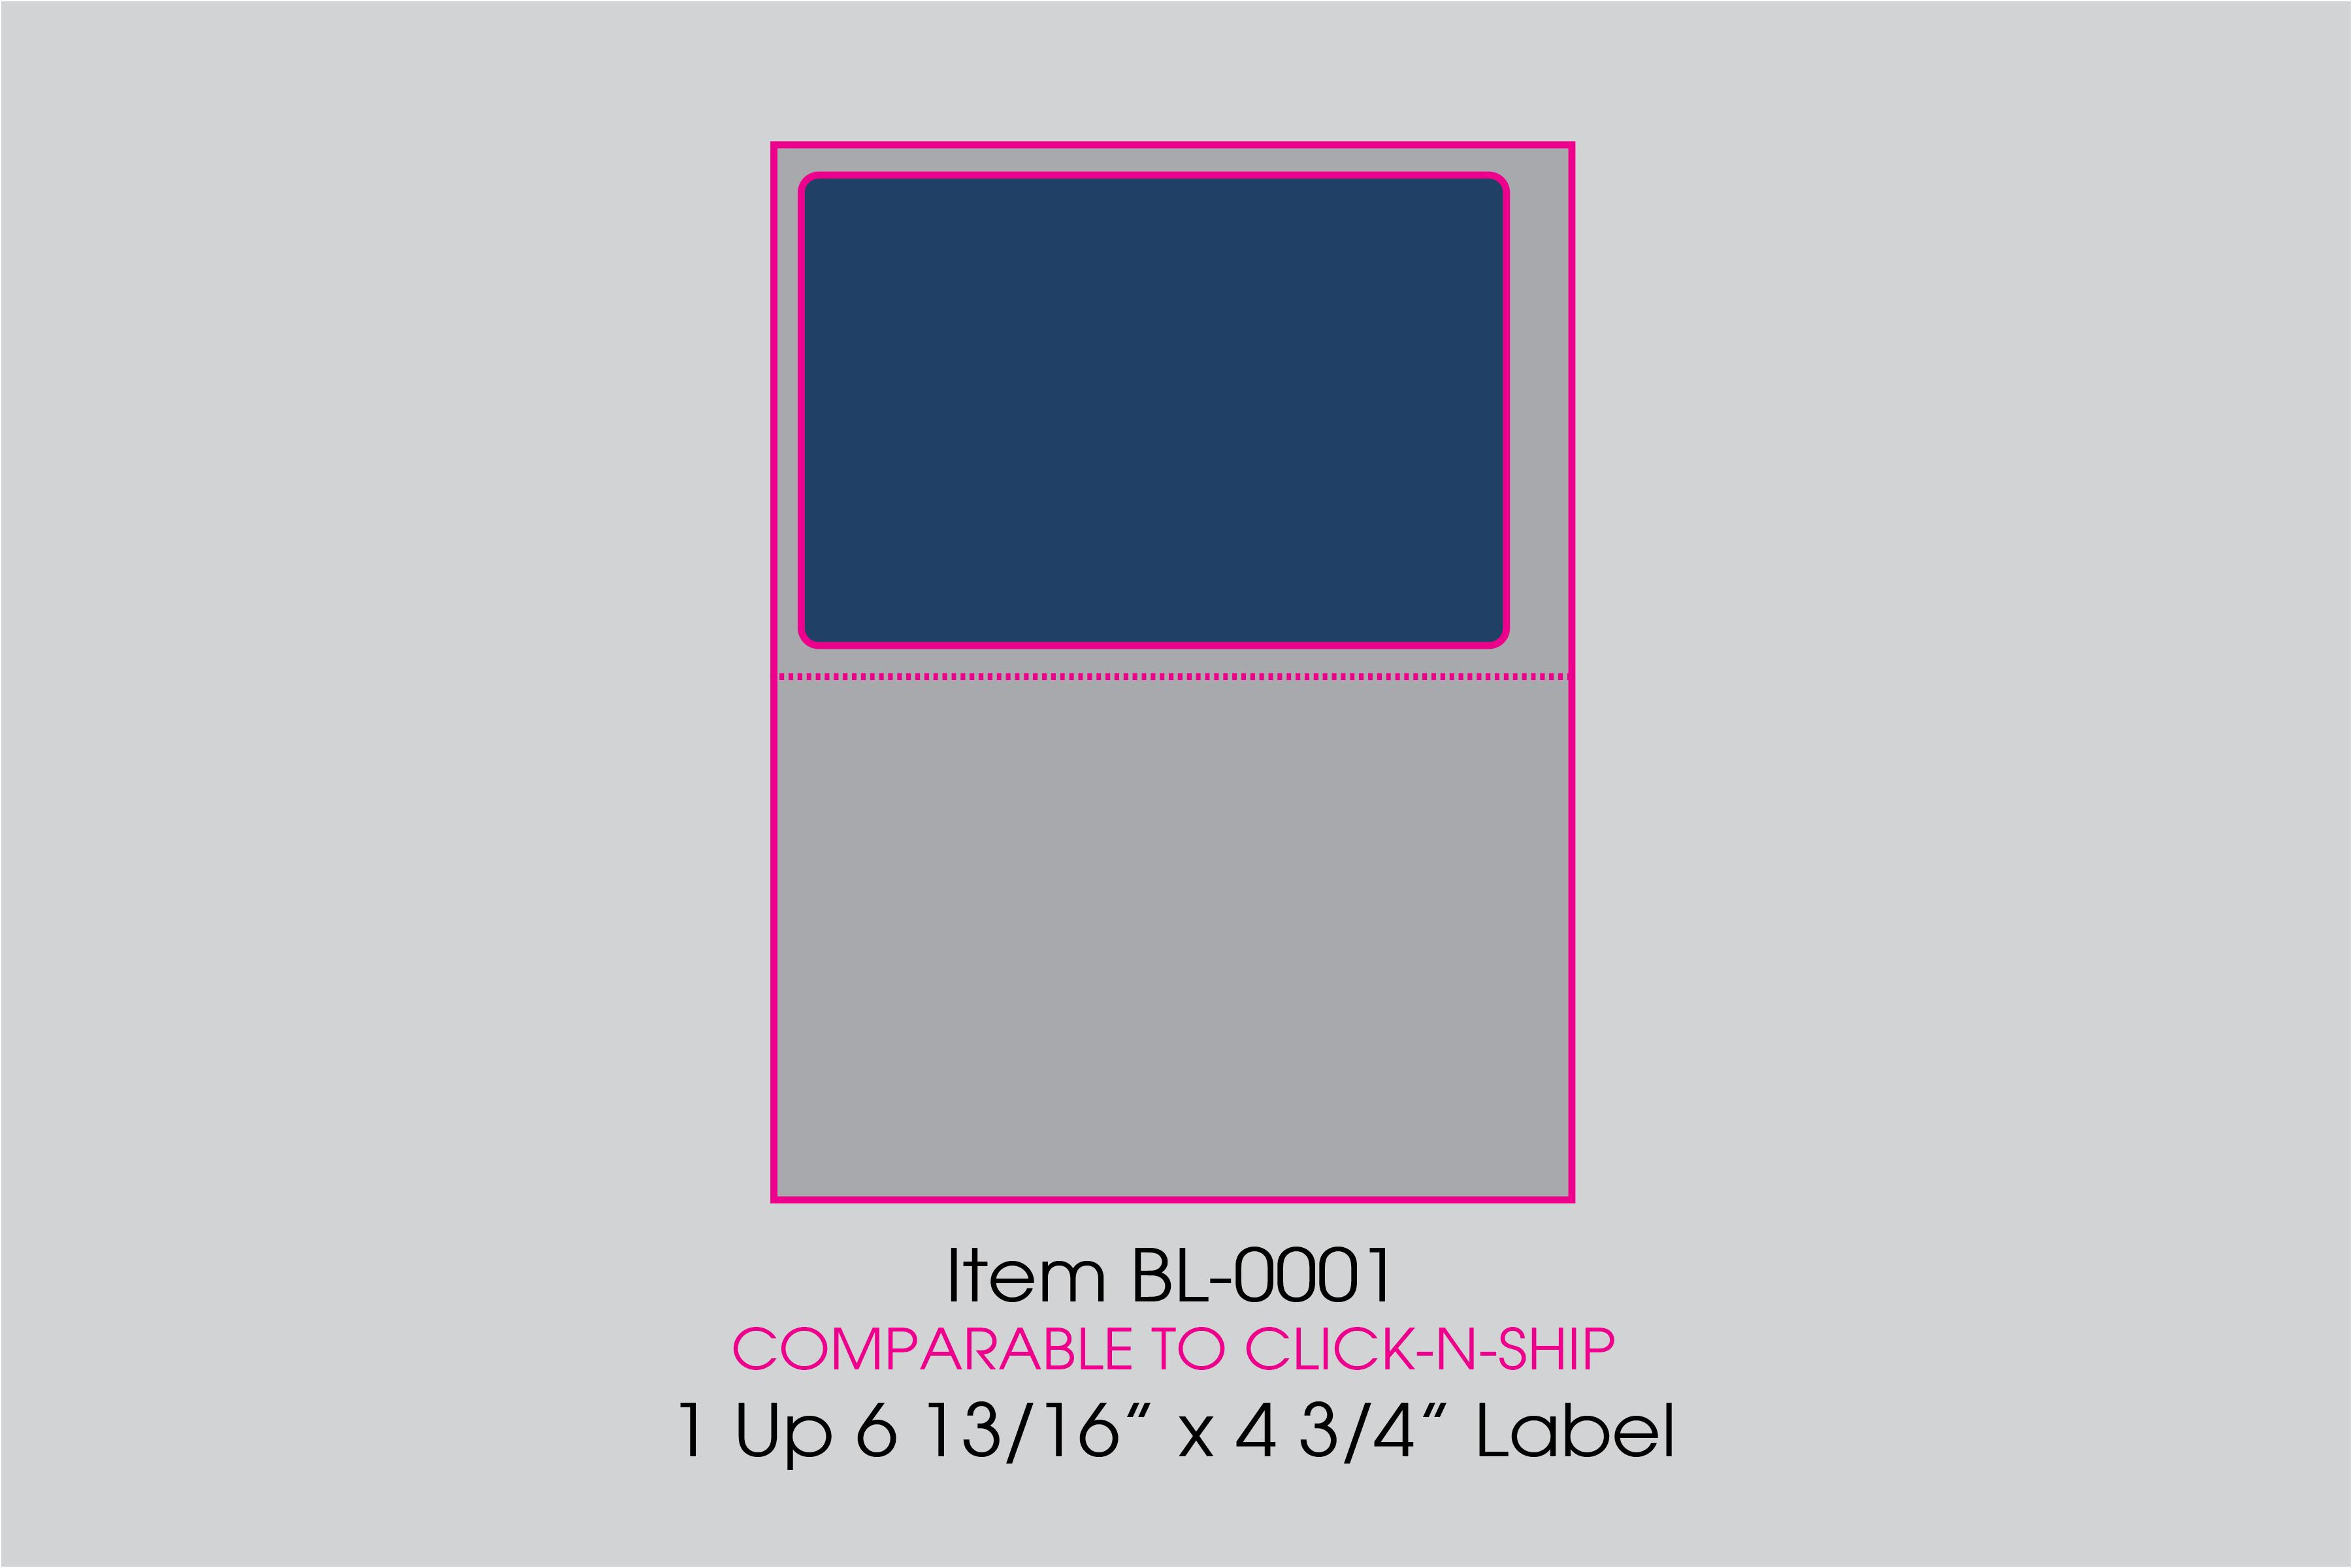 BL-0001